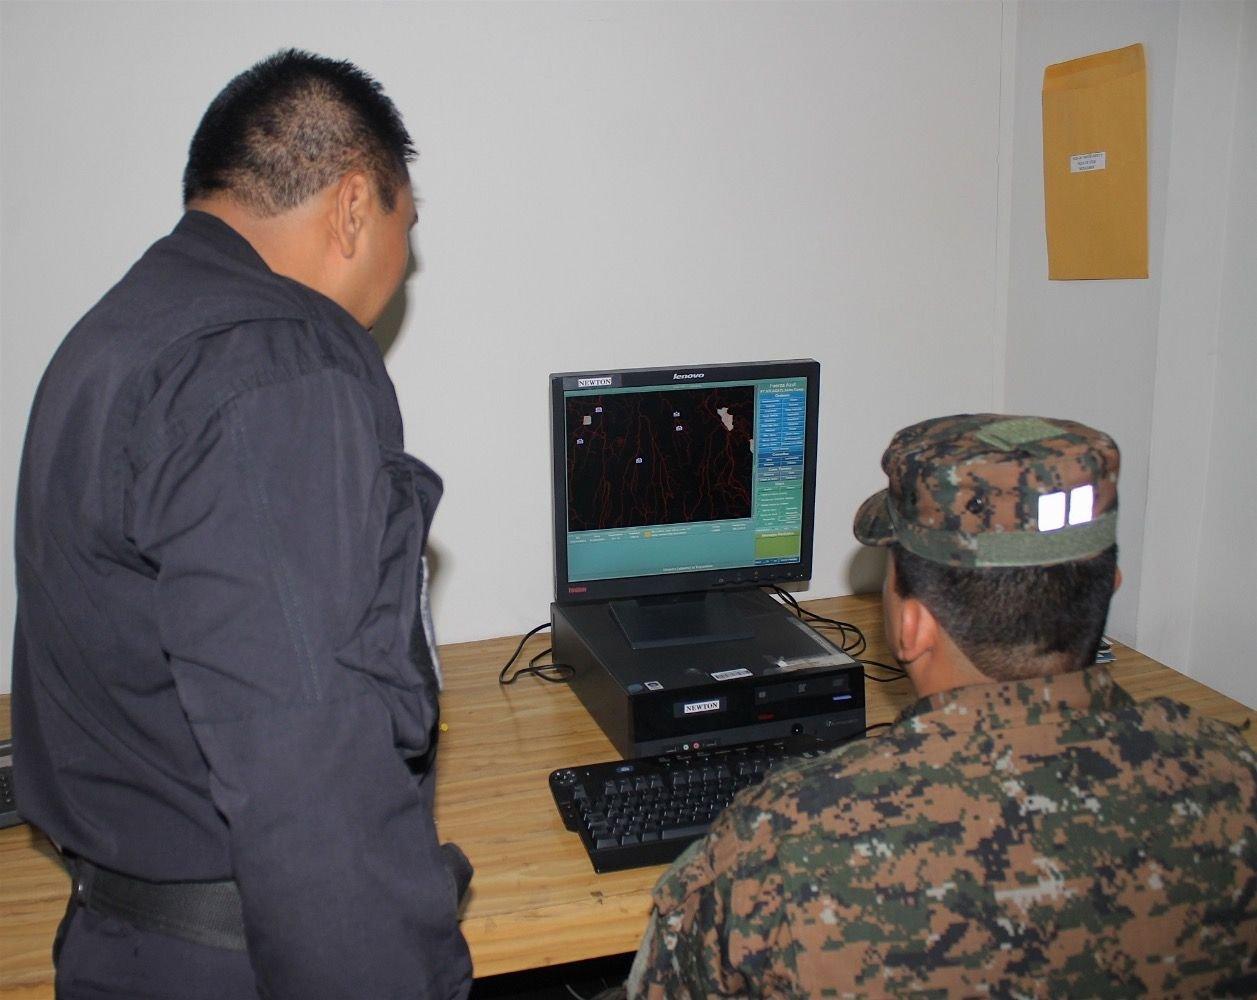 Computerized Simulators of Salvadoran Armed Forces Improve Rescue Operations